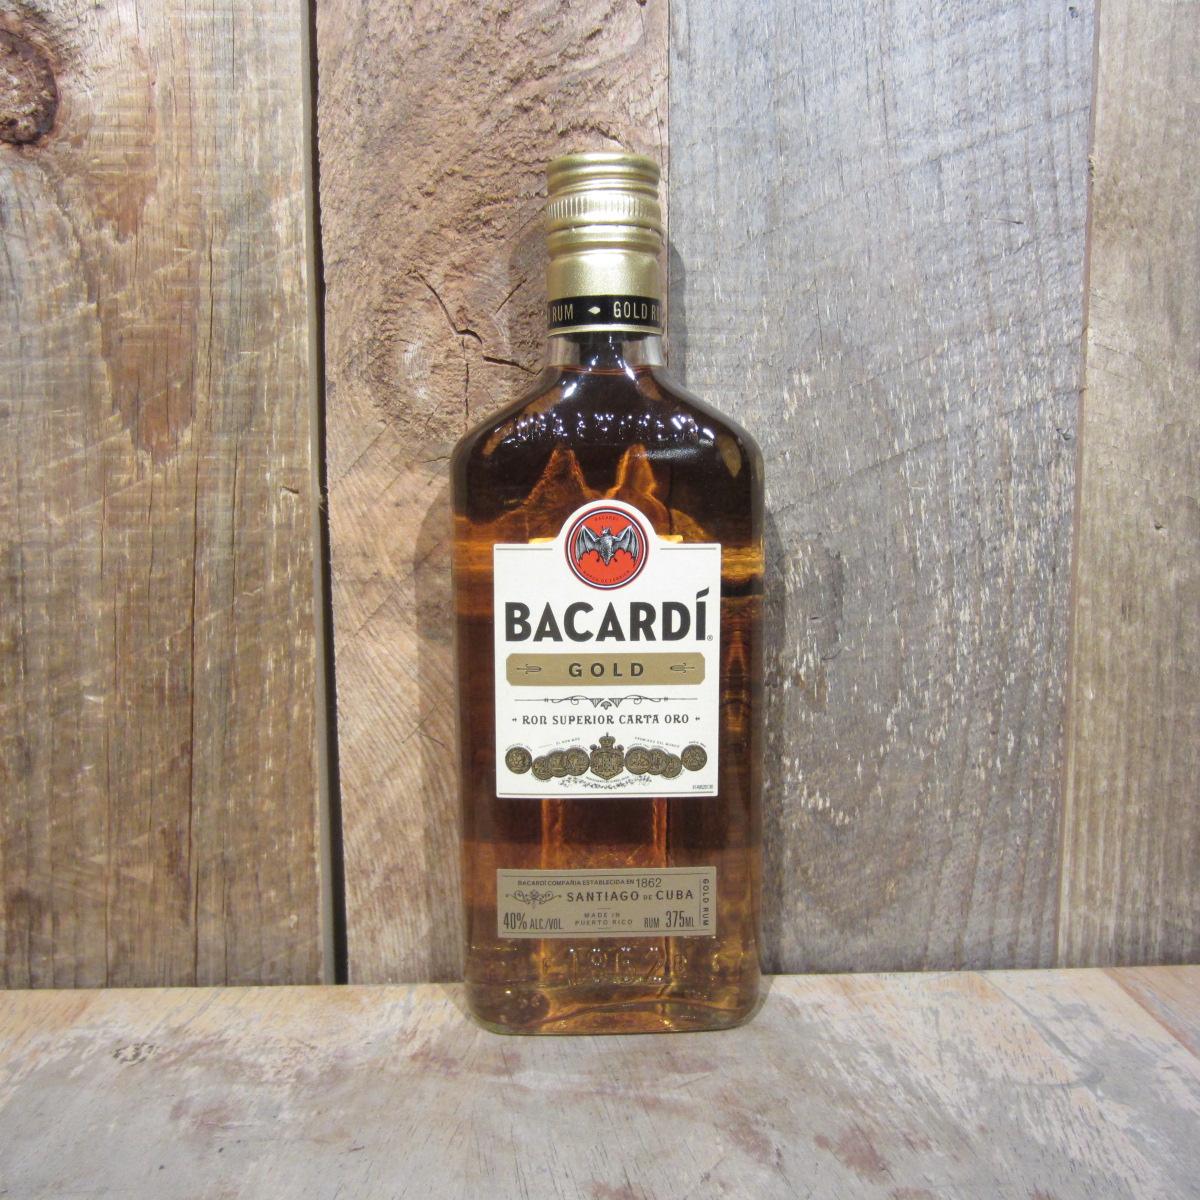 Bacardi Gold 375ml Pints (Half Size Btls)